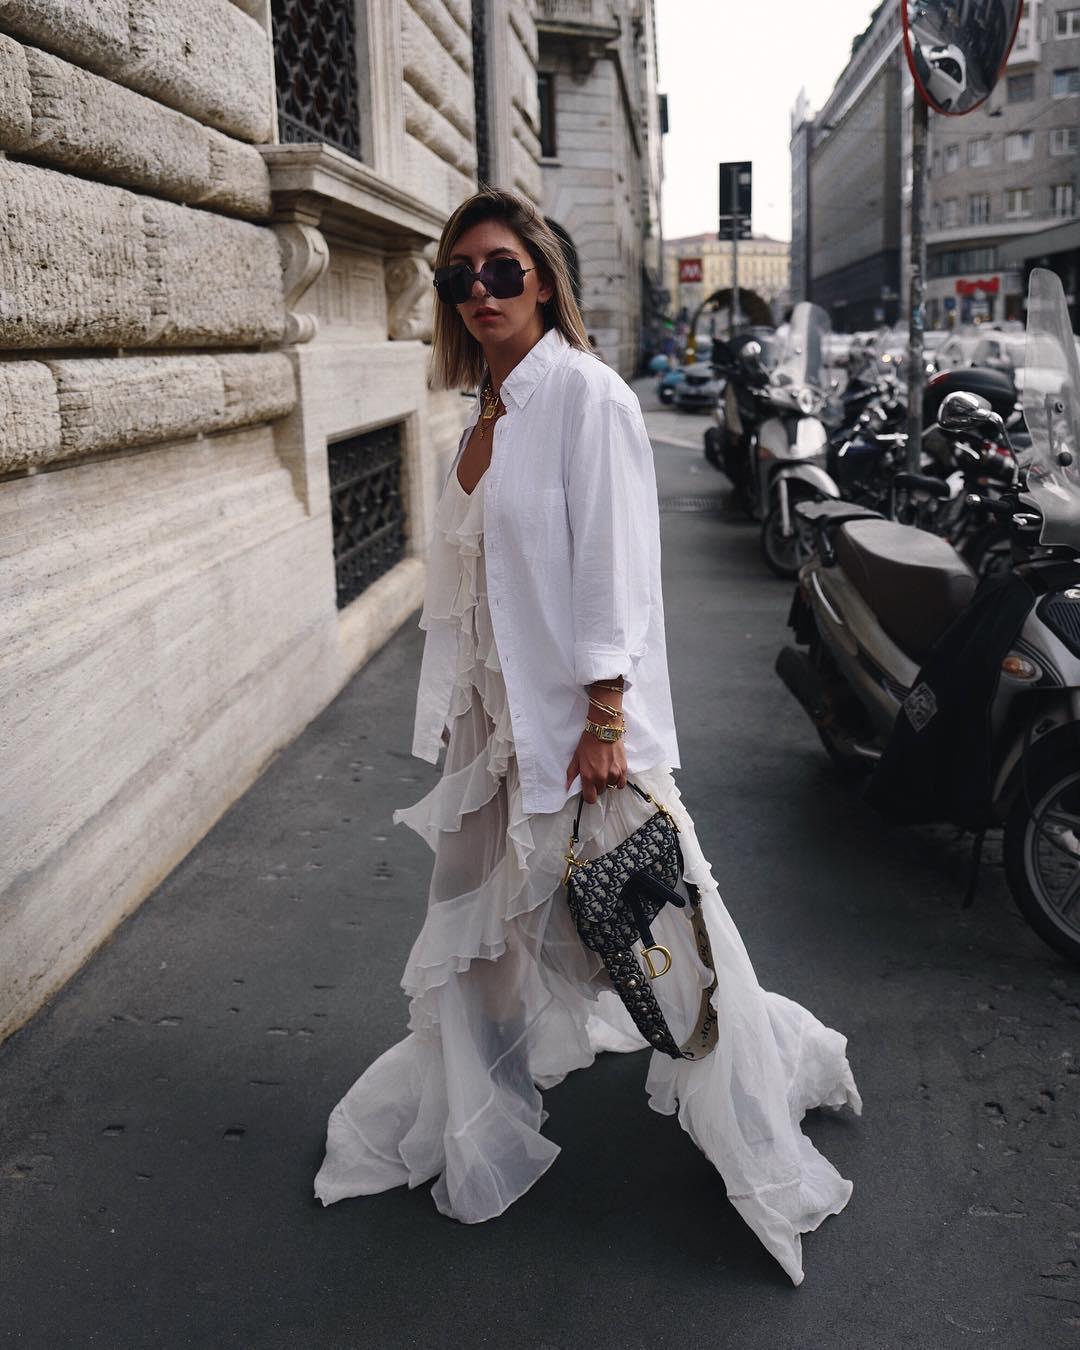 modnye tendencii leta 2019 goda 20 ultramodnyh obrazov